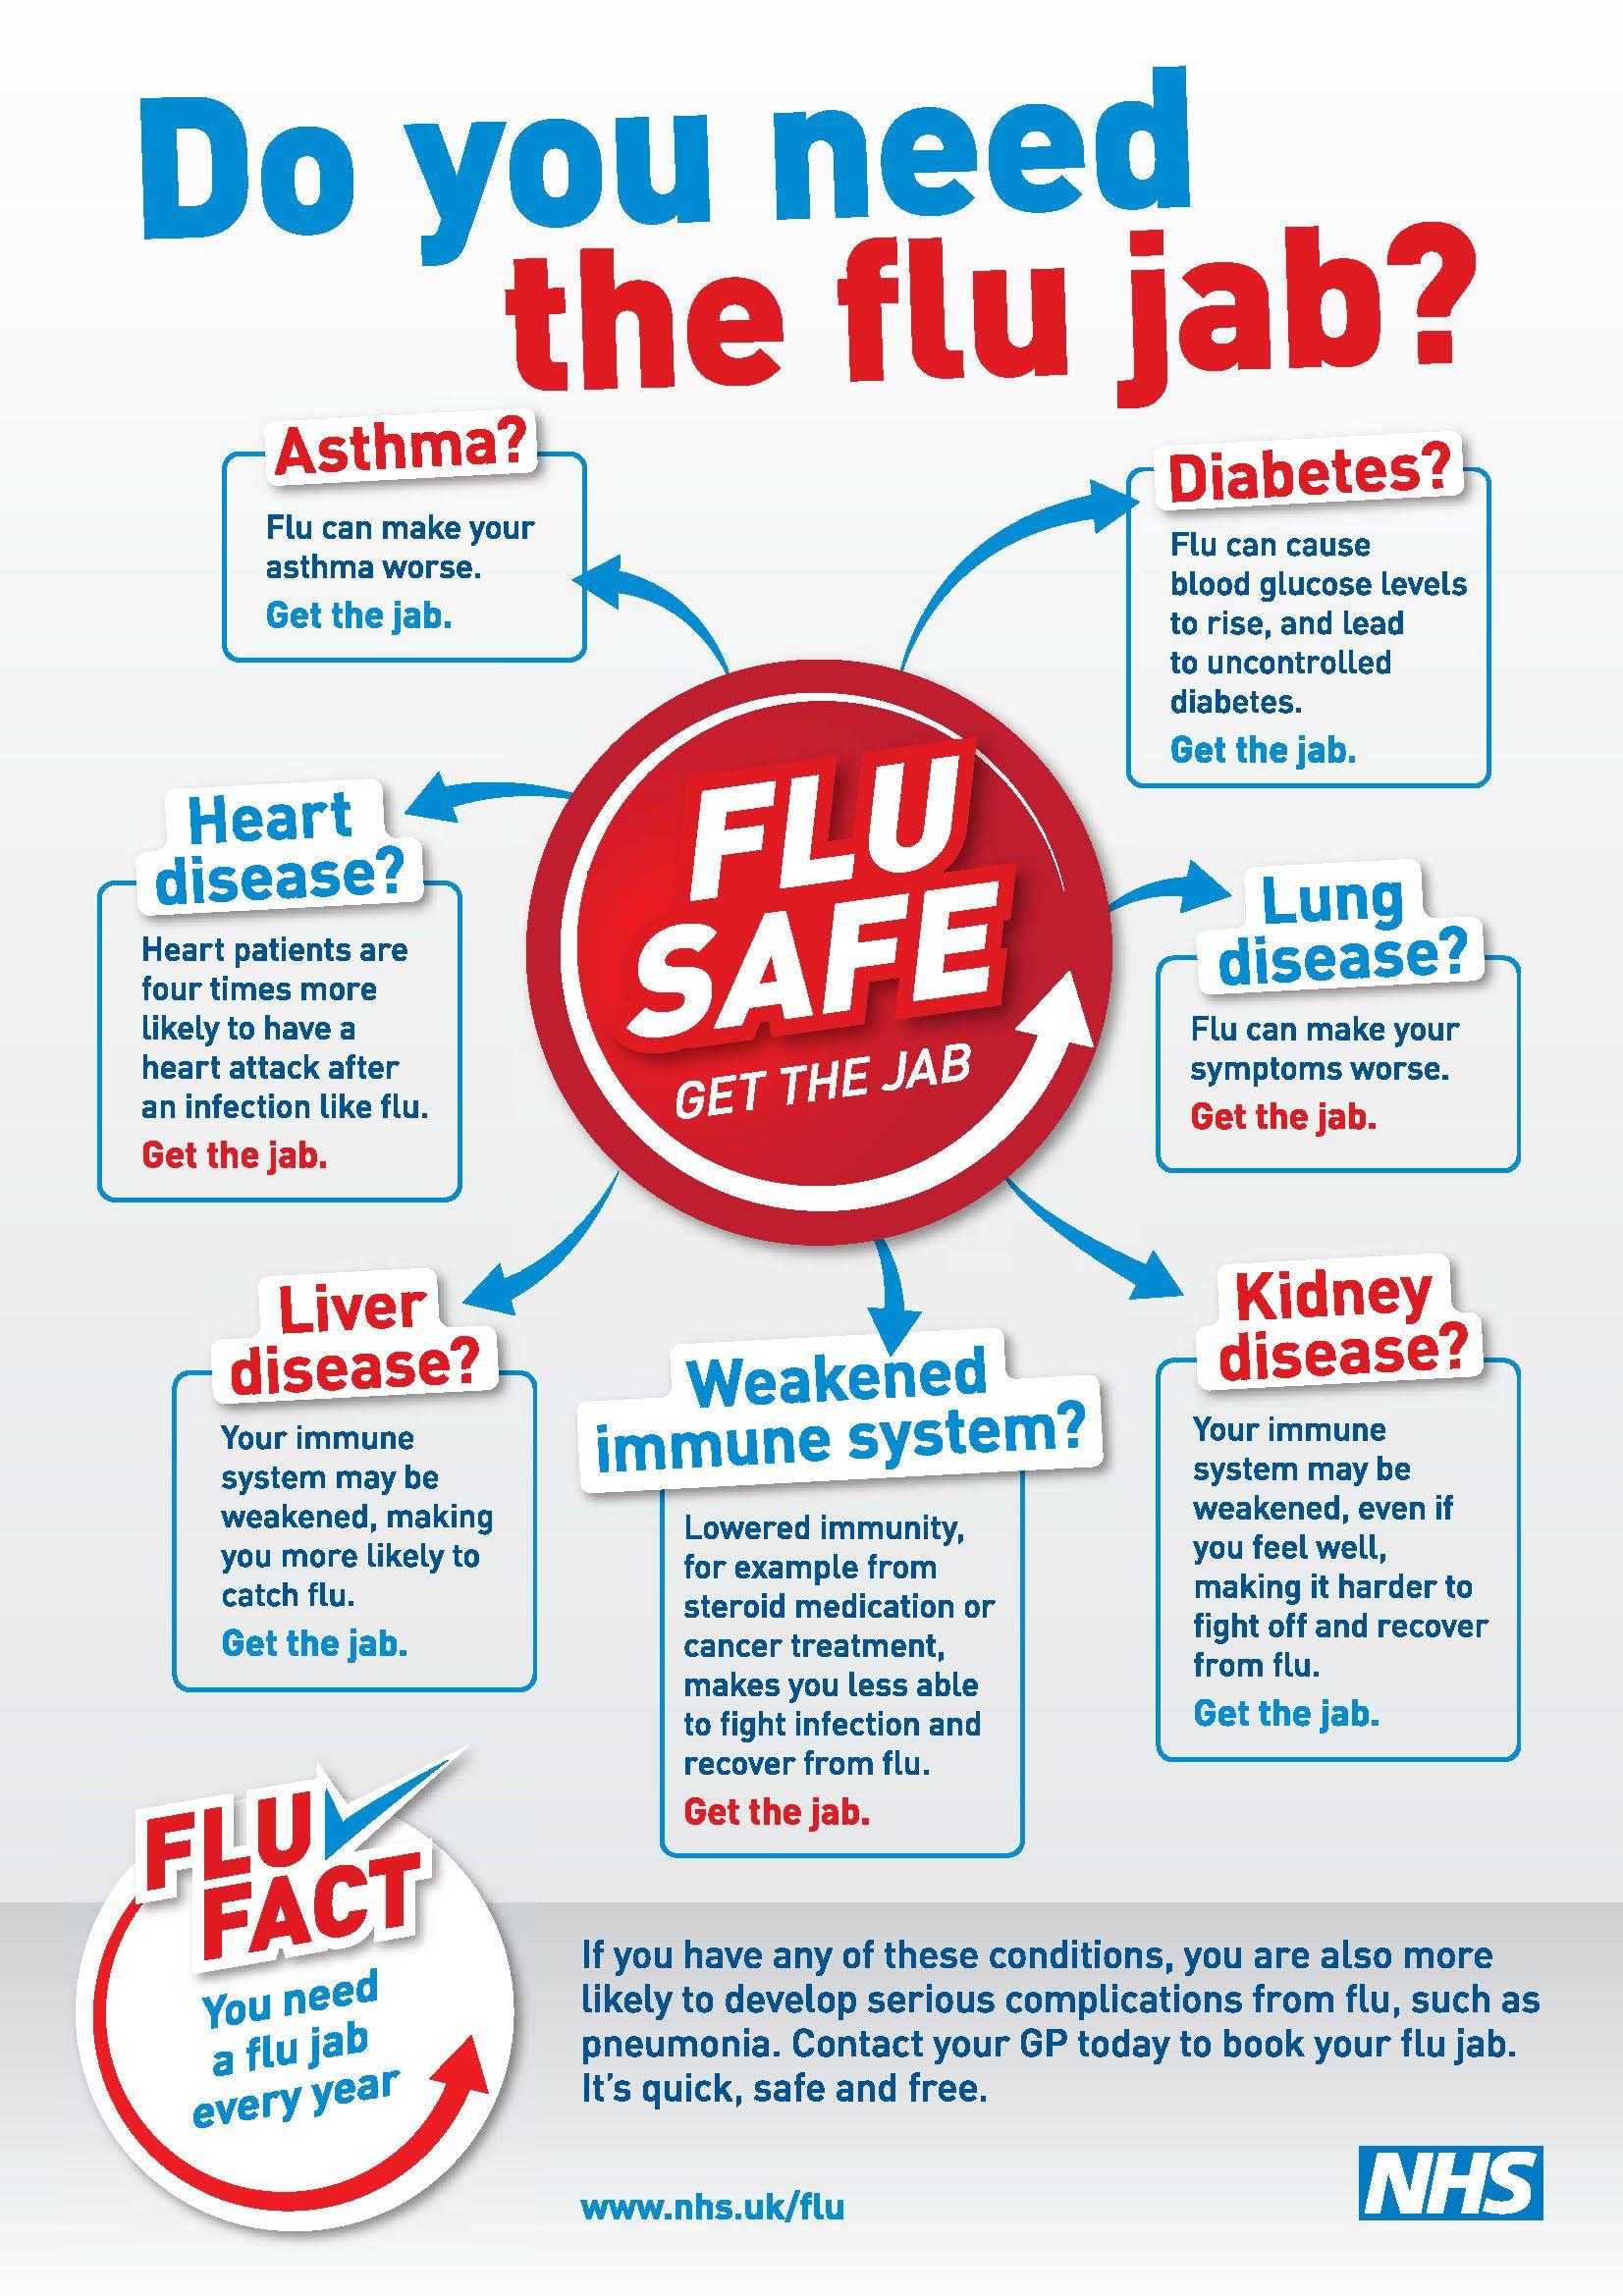 flu jab - photo #5